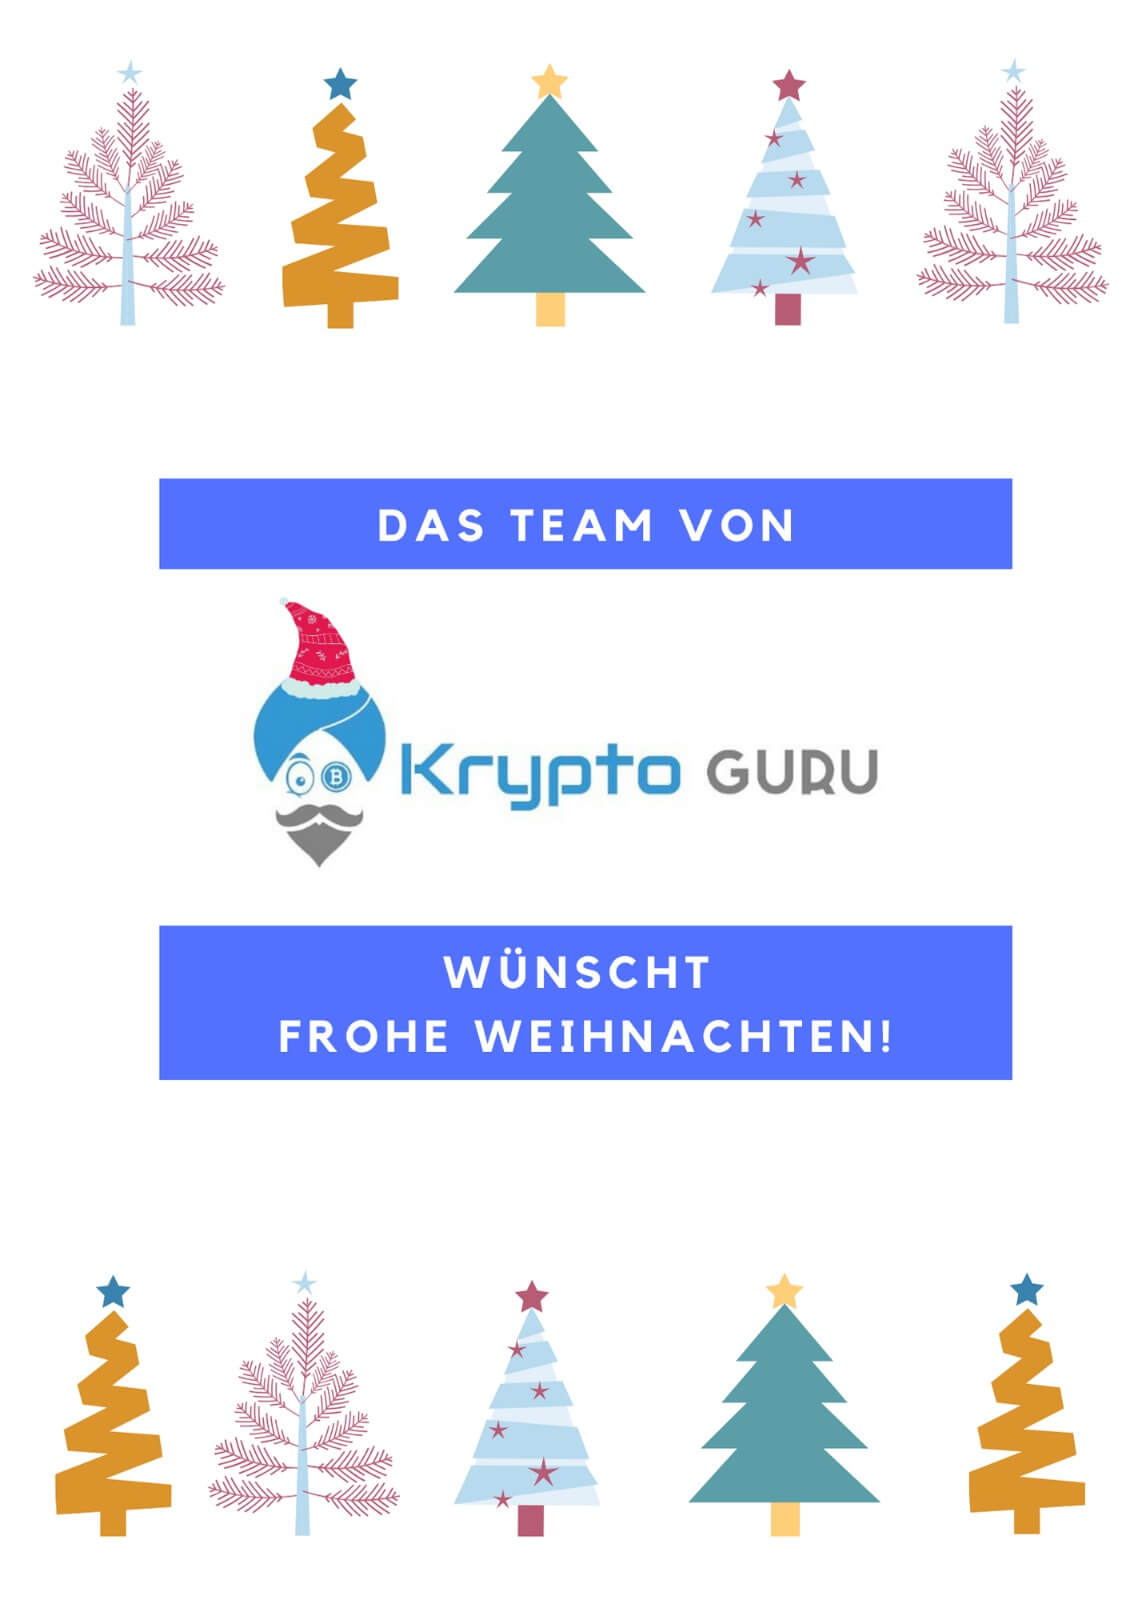 Krypto Guru Weihnachten - Bitcoin 2019 Bitcoin 2020